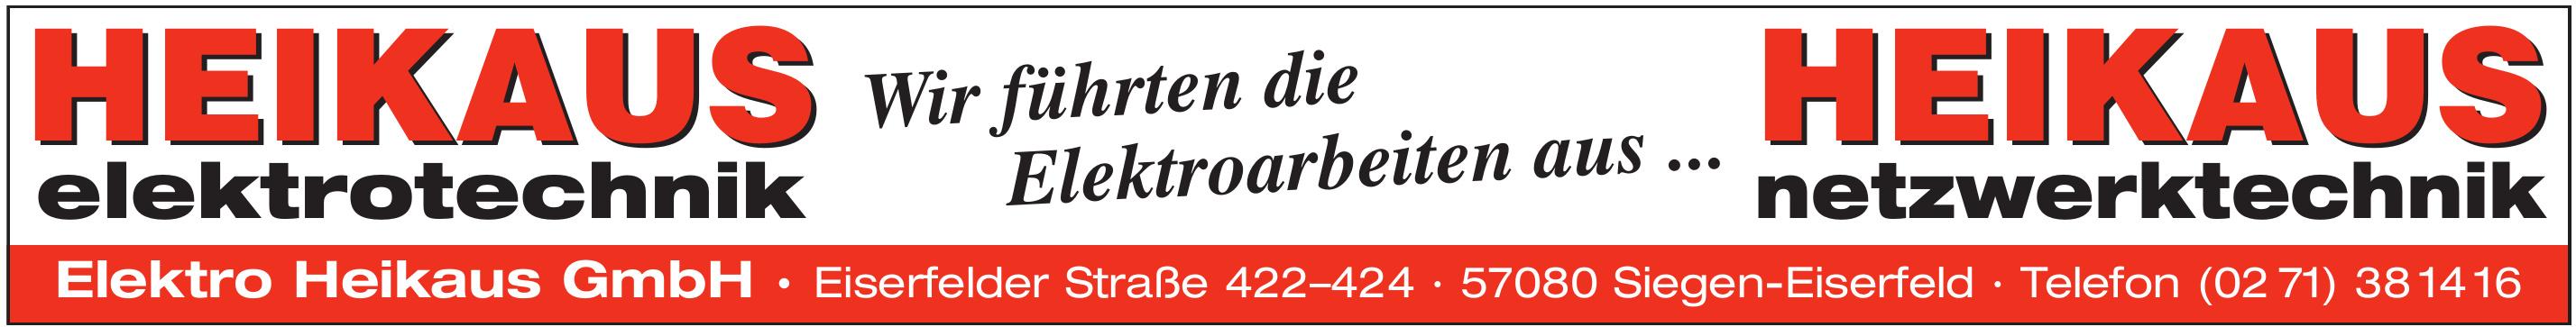 Elektro Heikaus GmbH